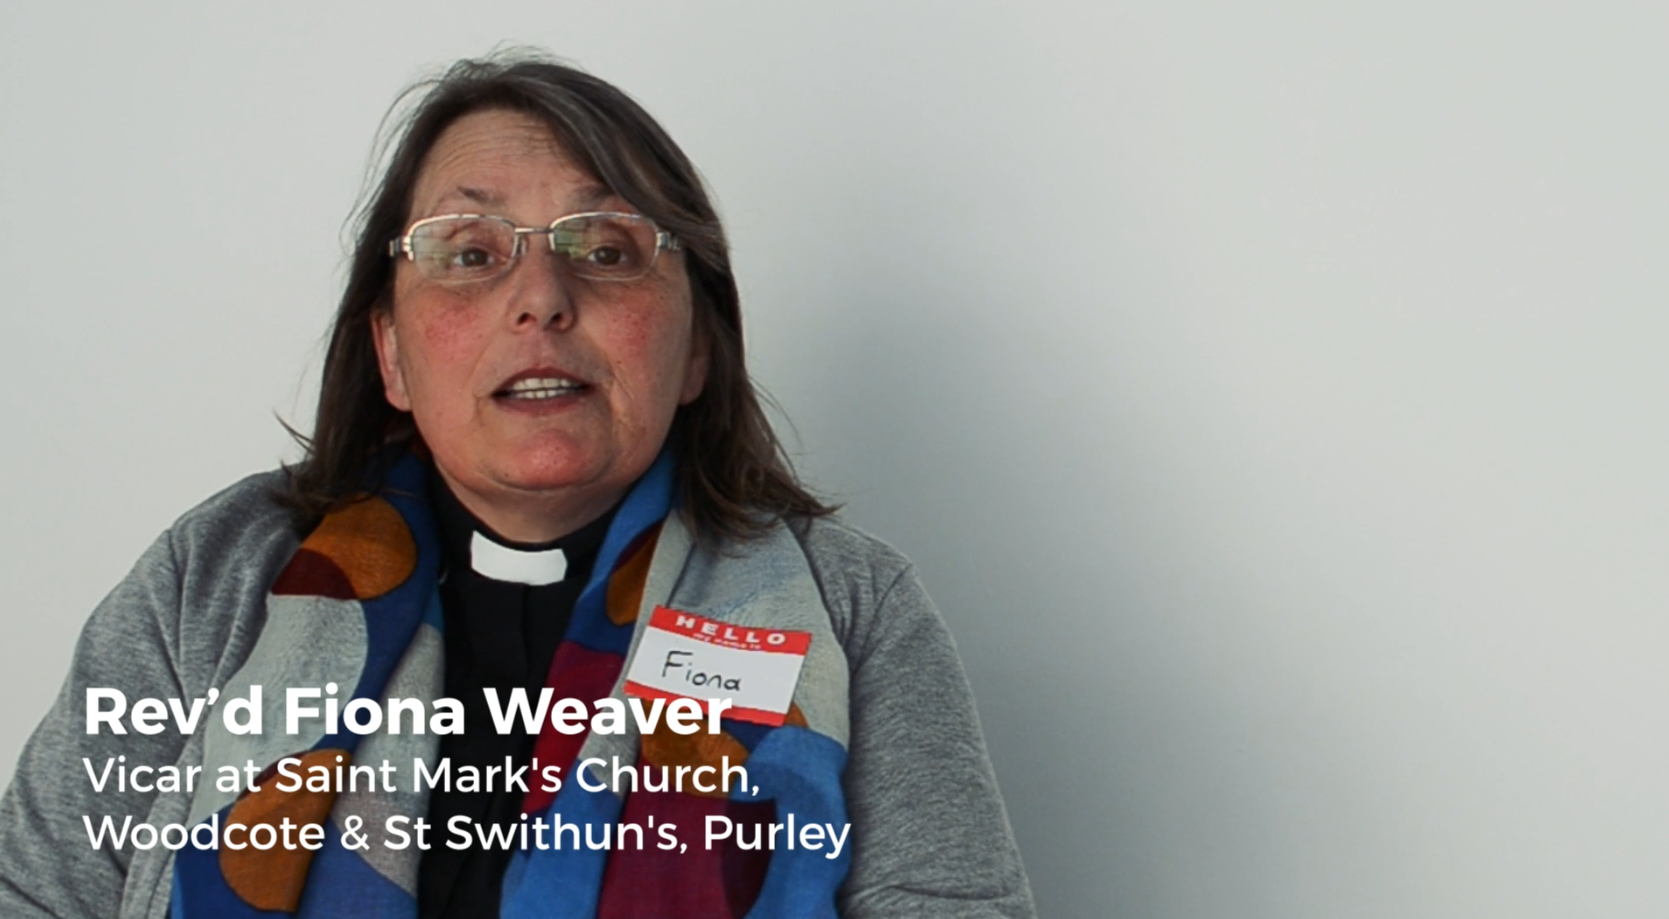 Fiona Weaver